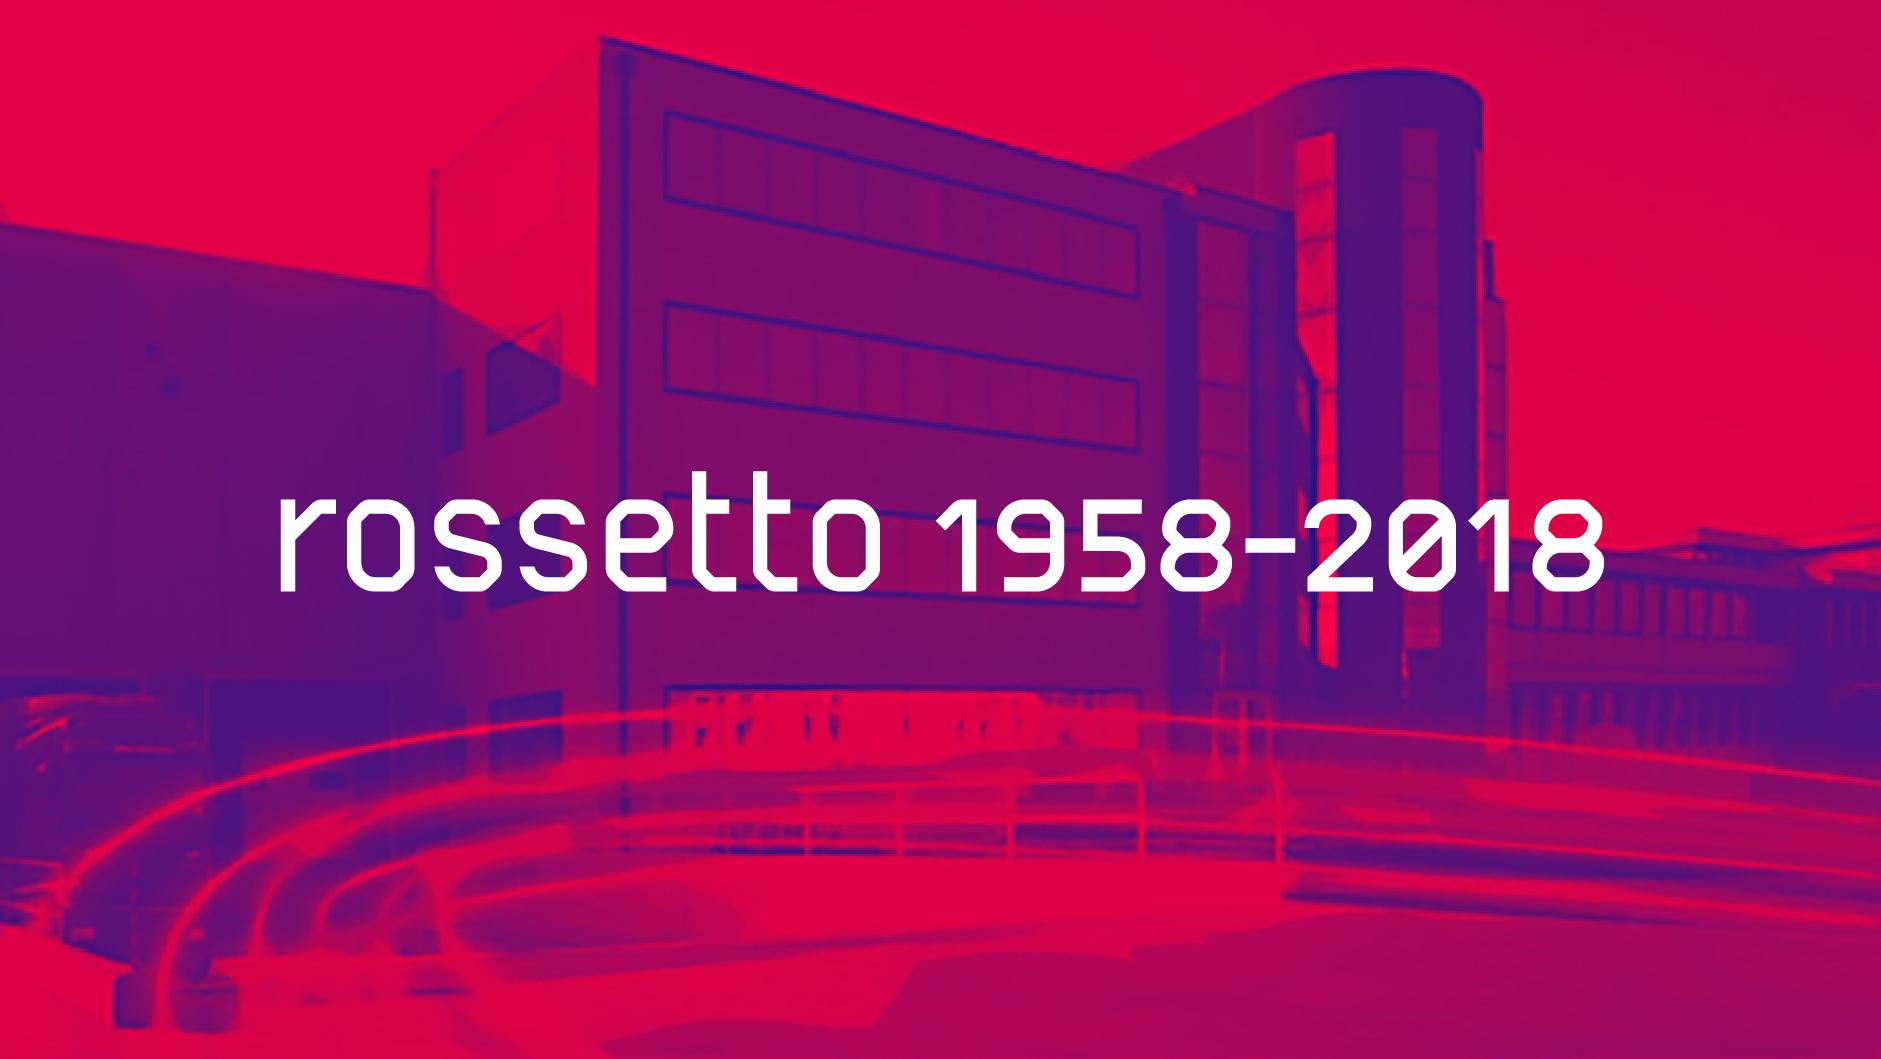 rossetto 1958-2018